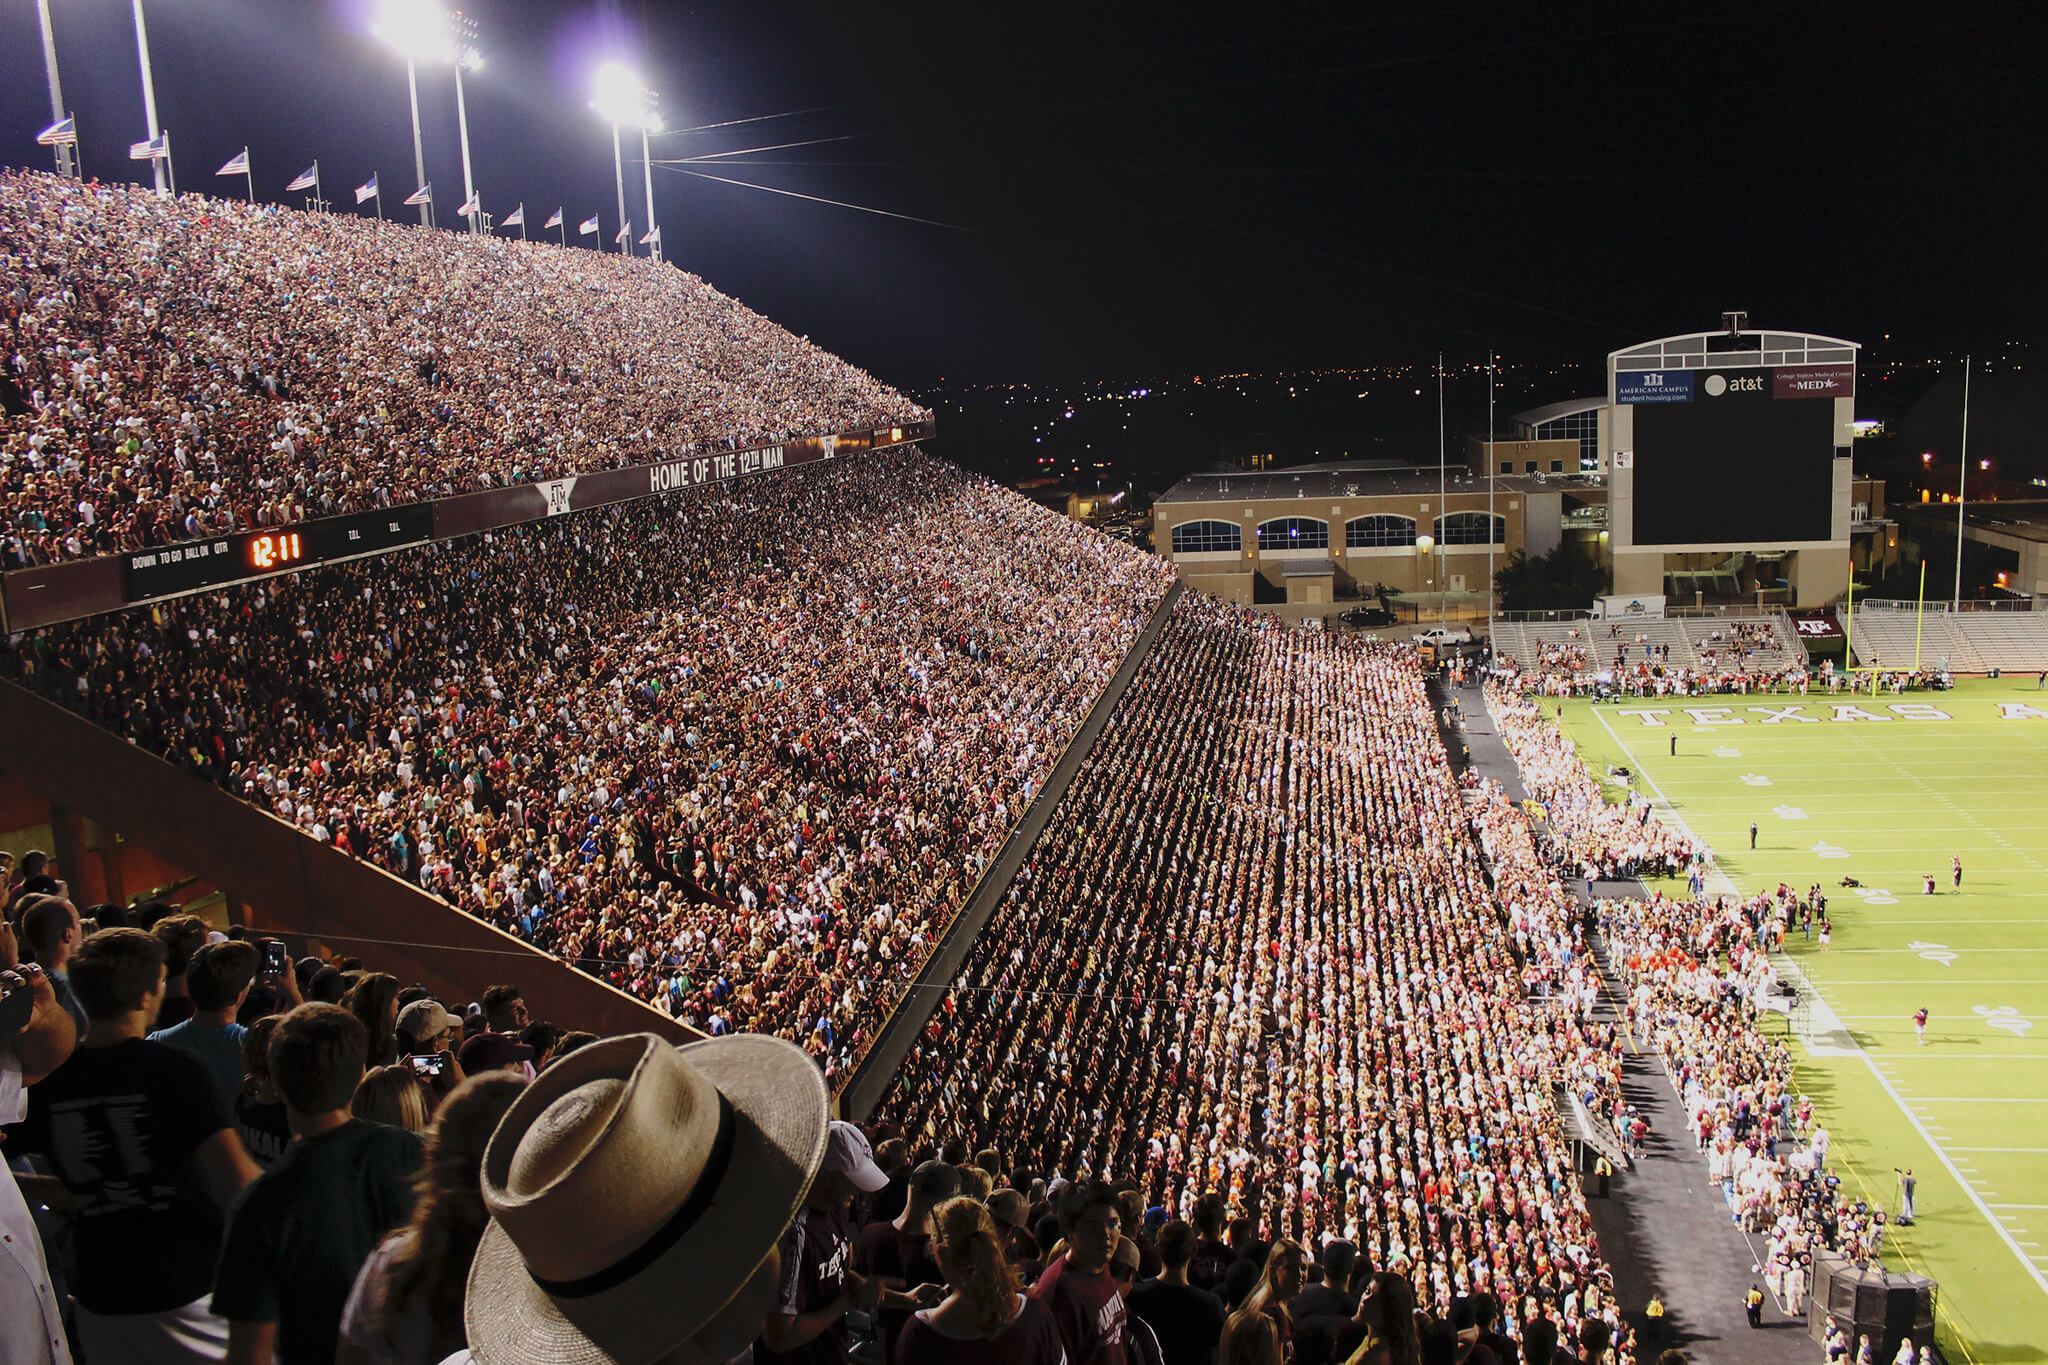 Texas AMs Midnight Yell tradition